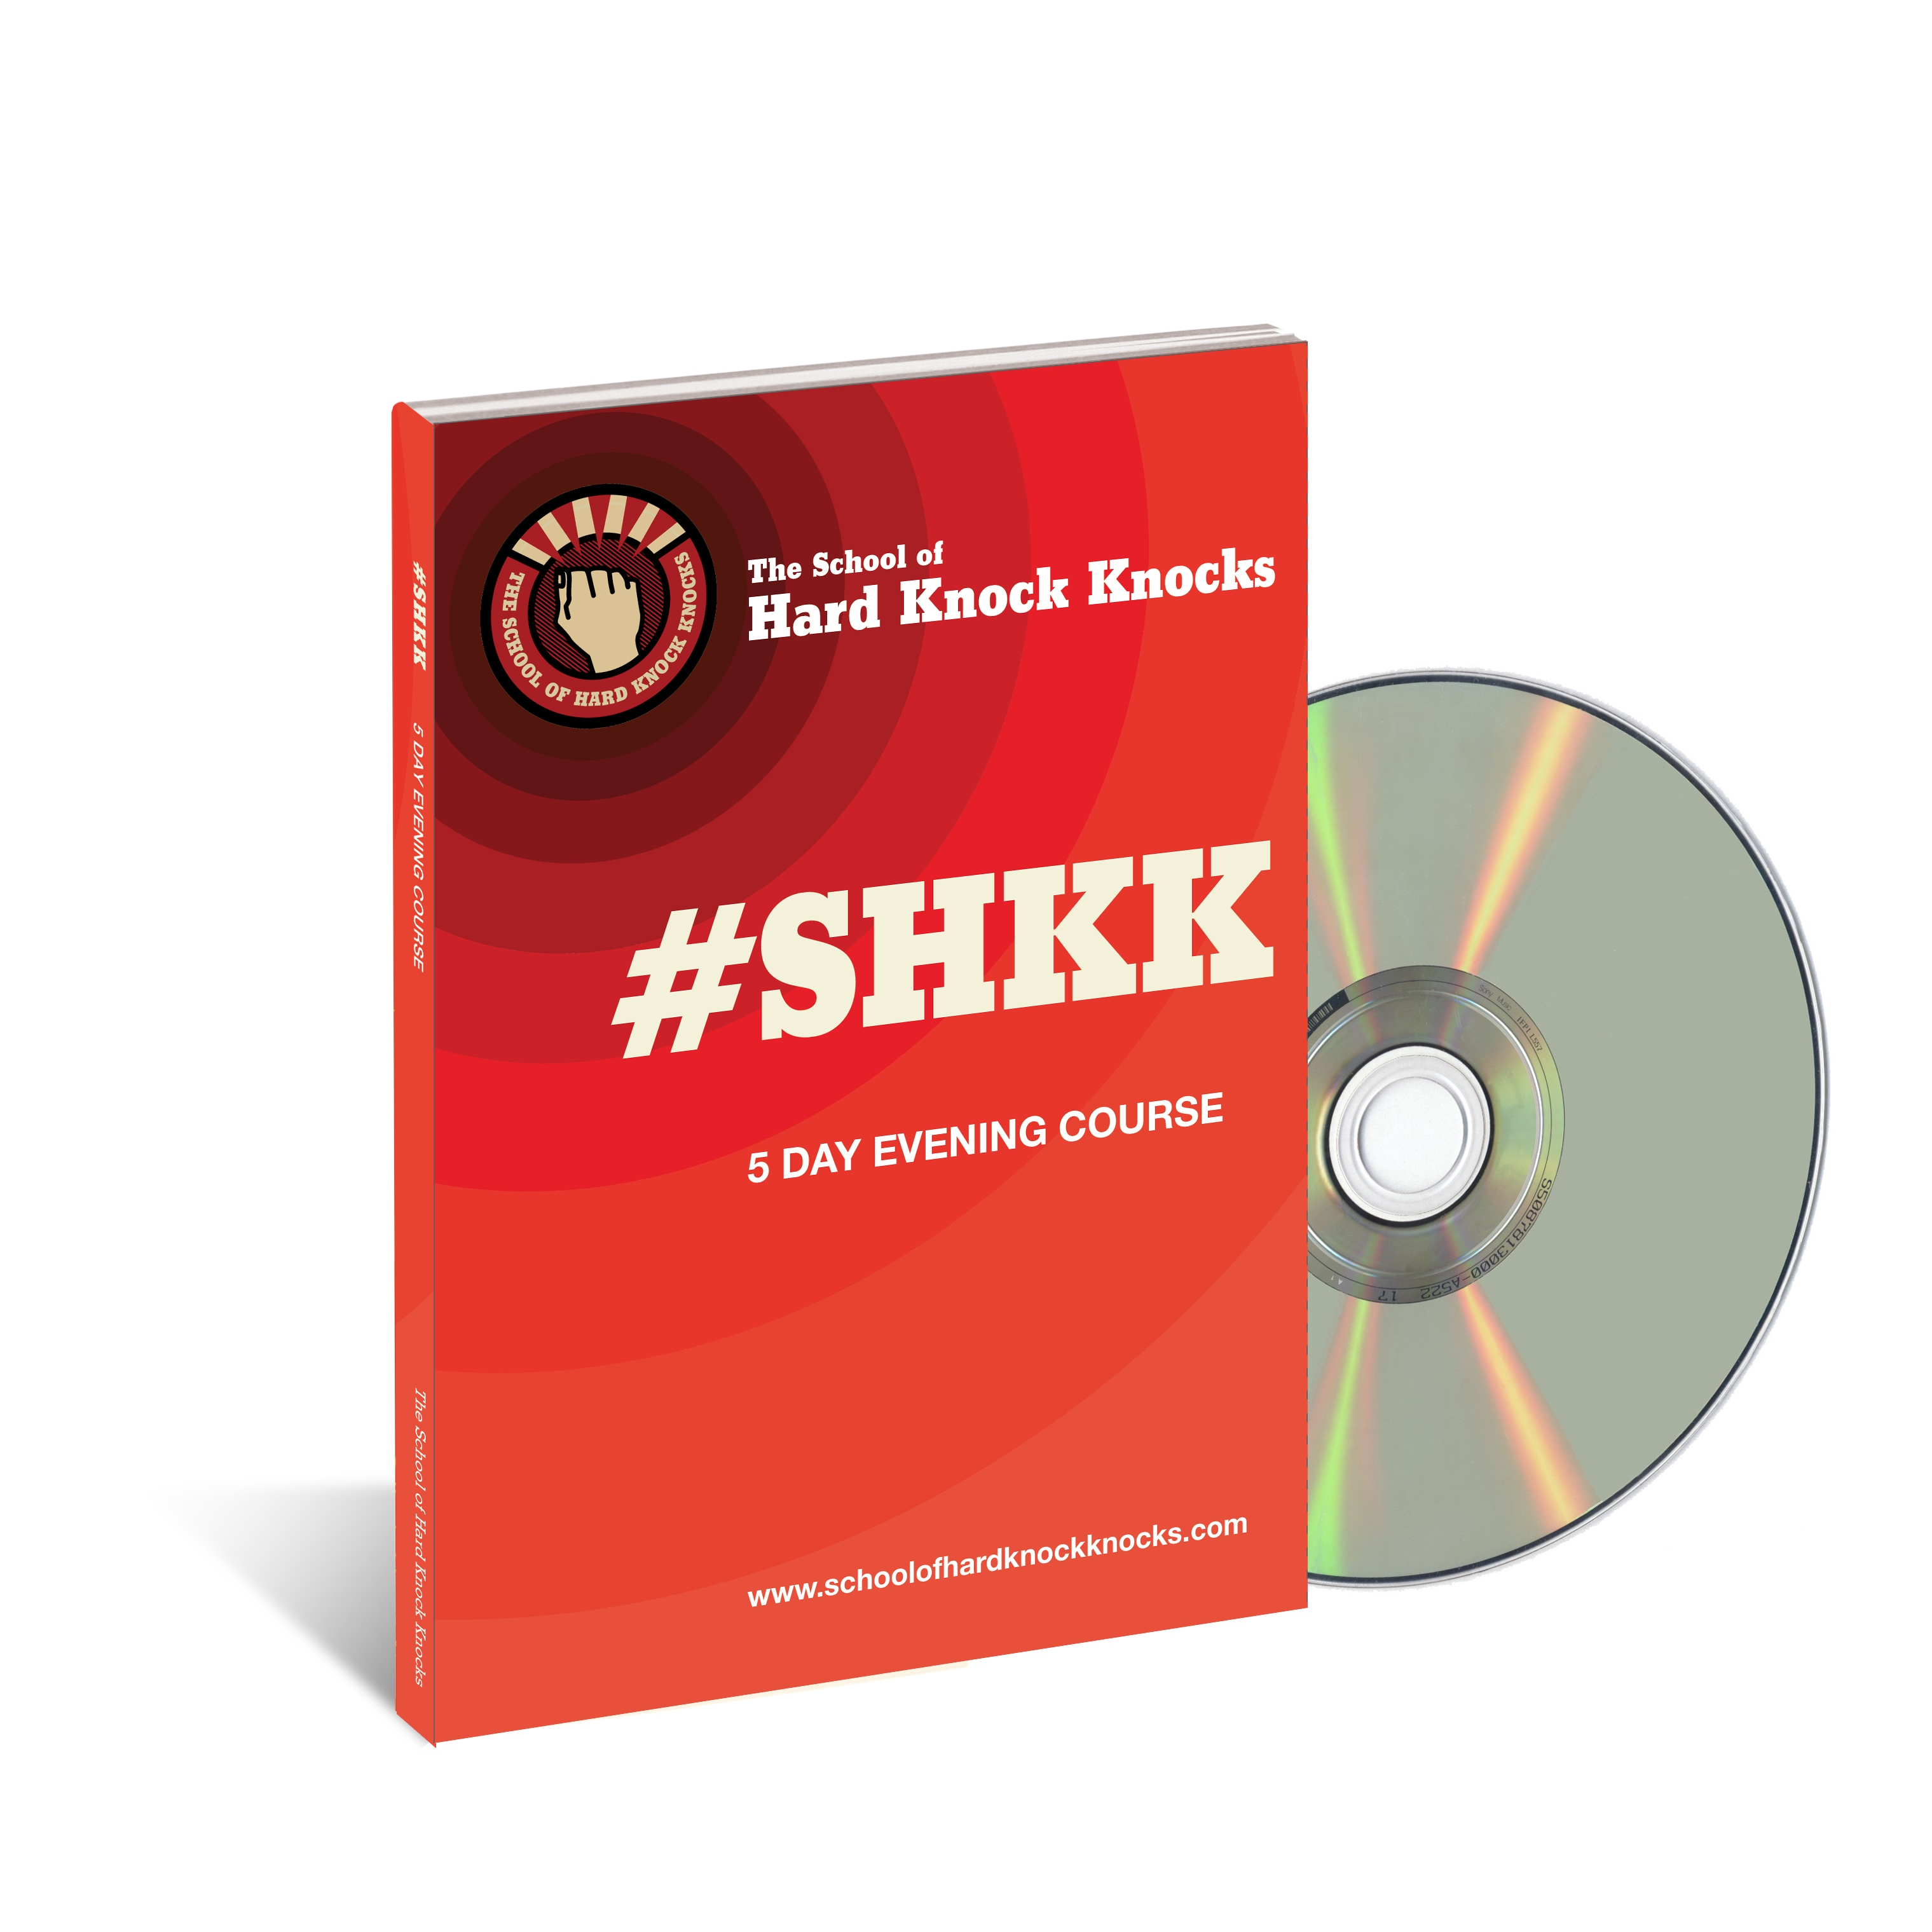 School of Hard Knock Knocks manual and DVD